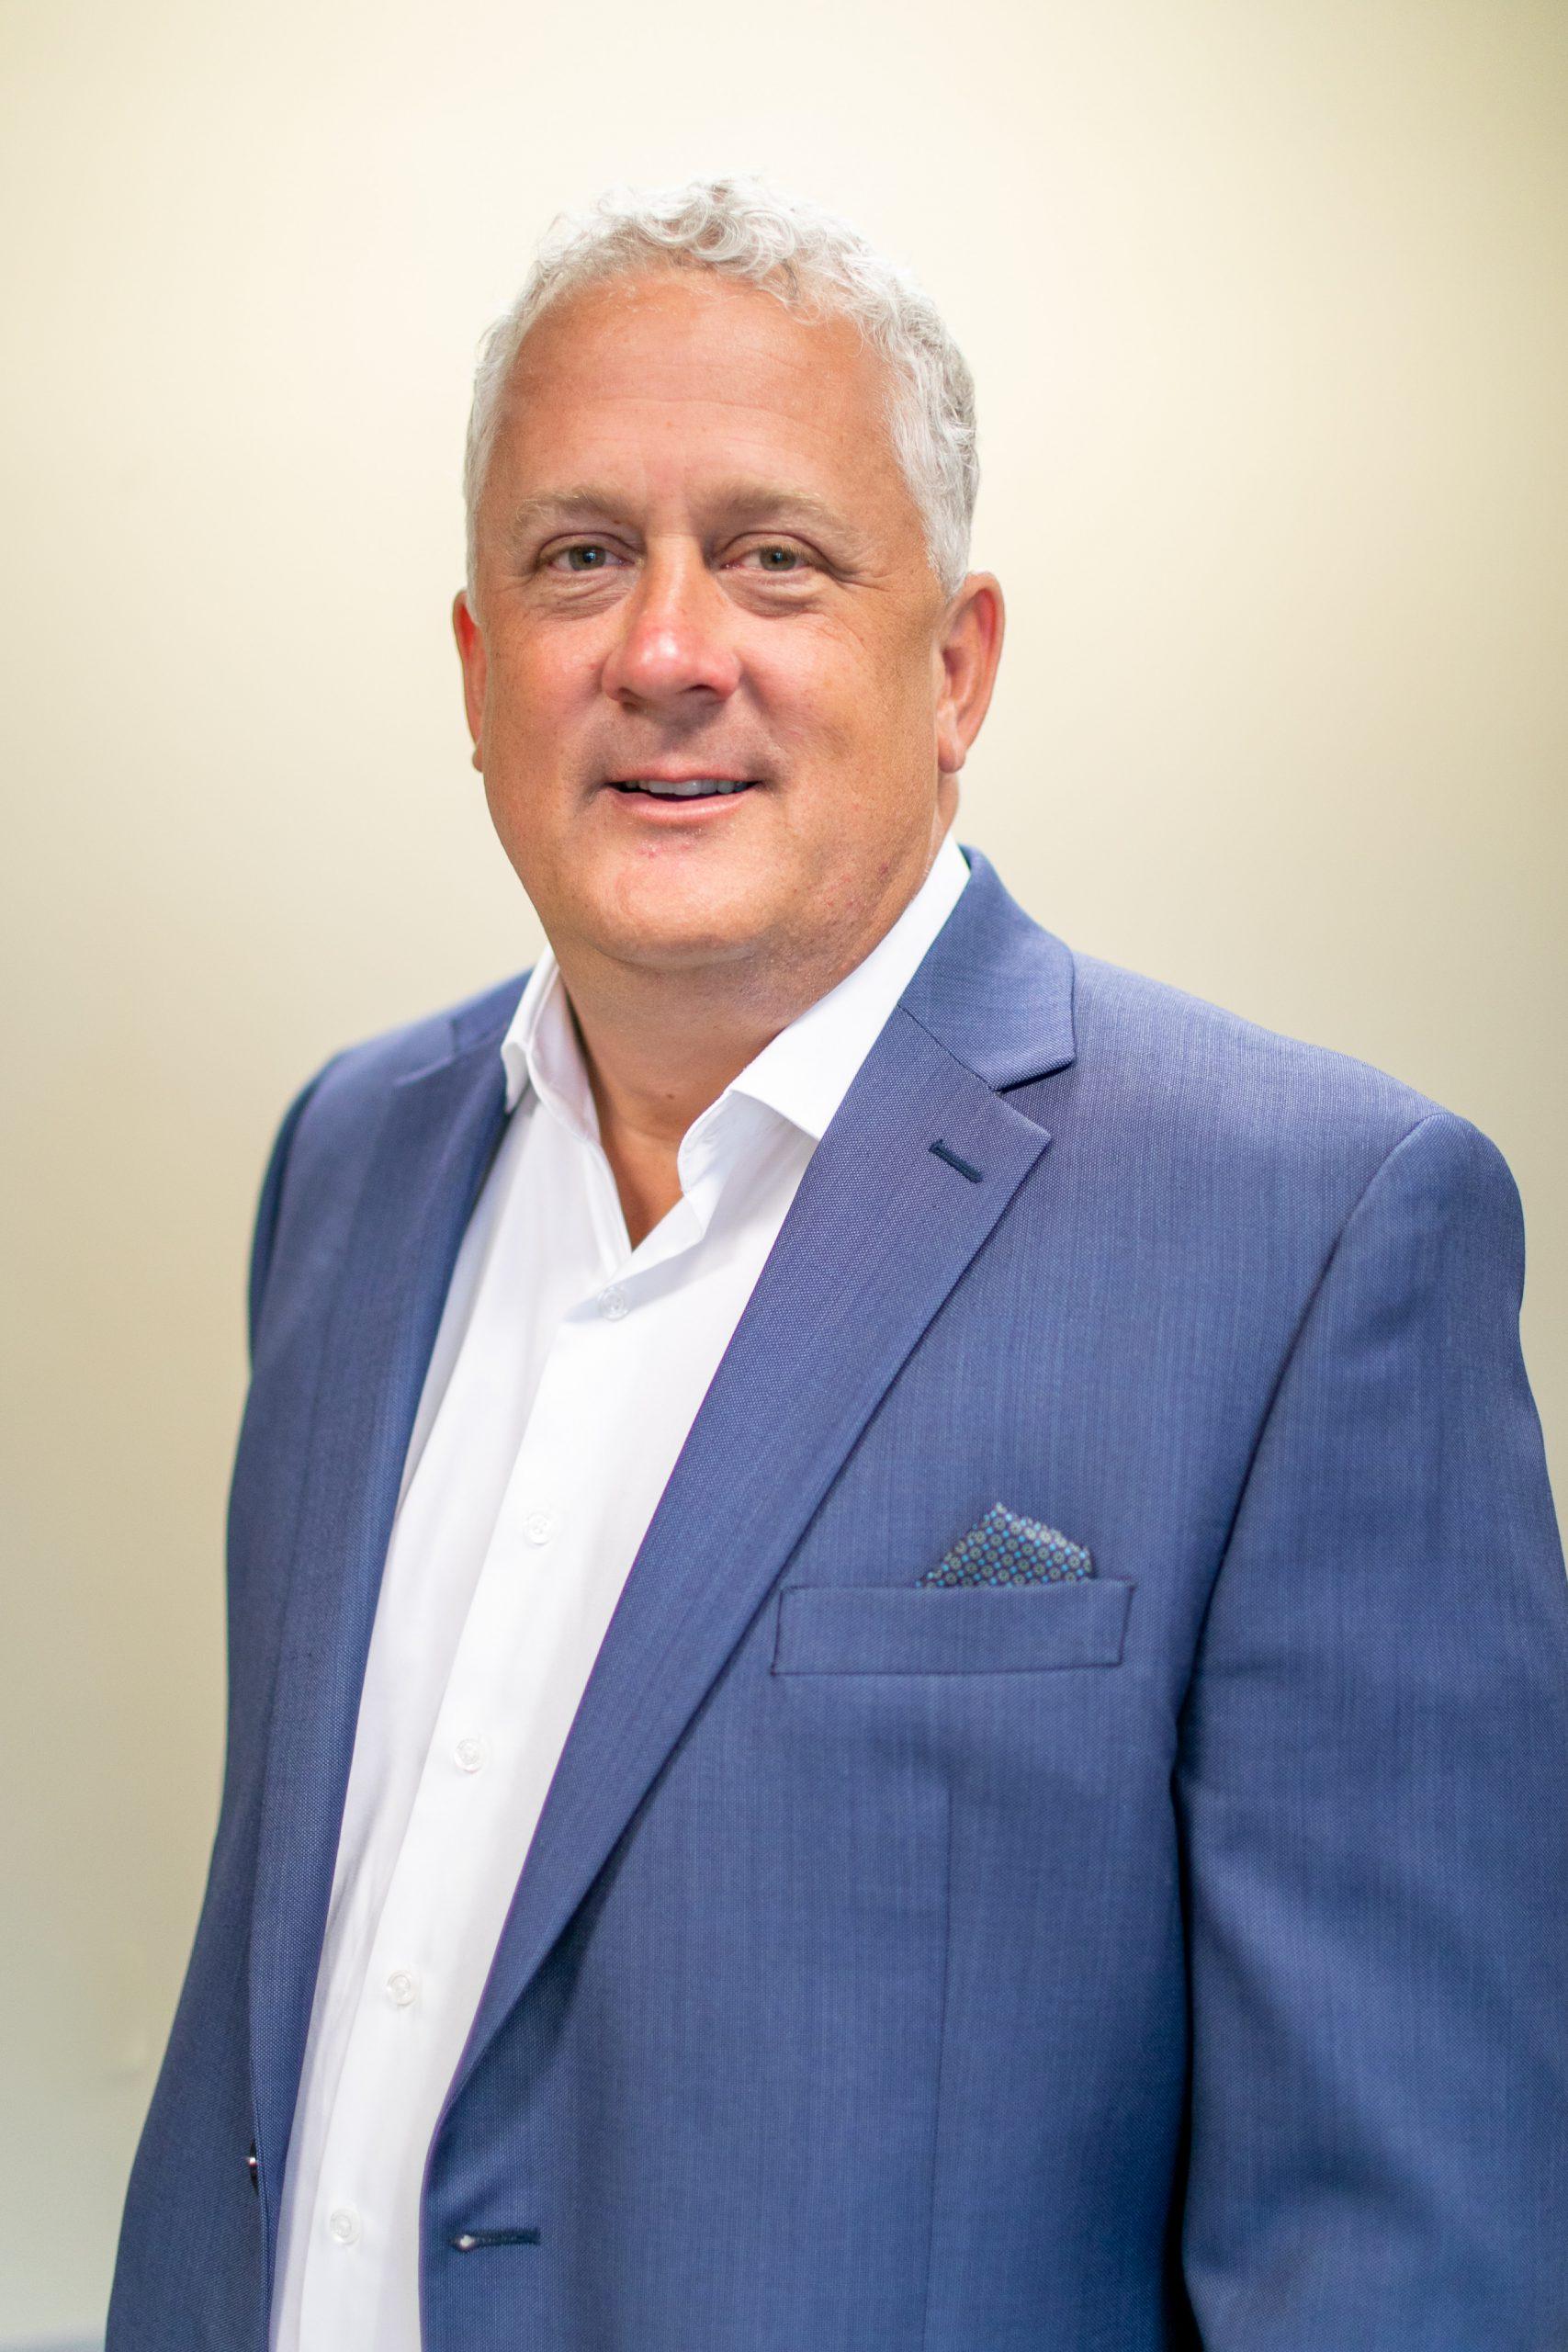 Chad Ogle - VP of Sales